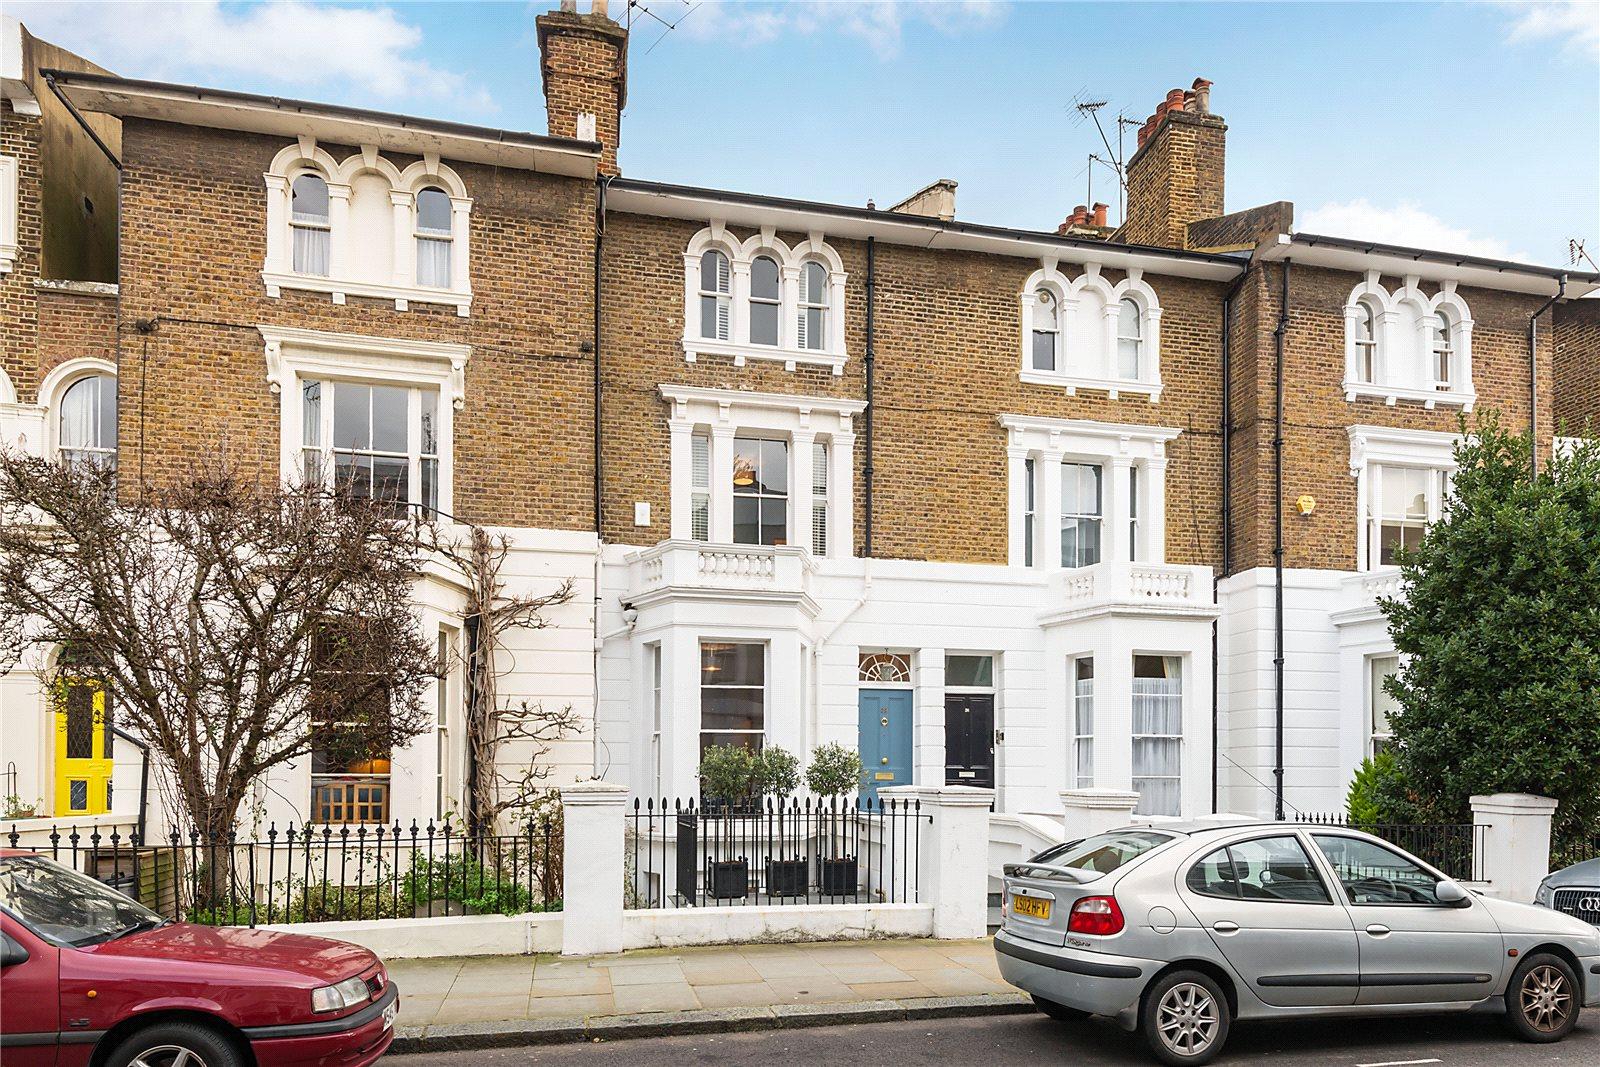 Частный дом для того Продажа на Portland Road, Holland Park, London, W11 Holland Park, London, Англия